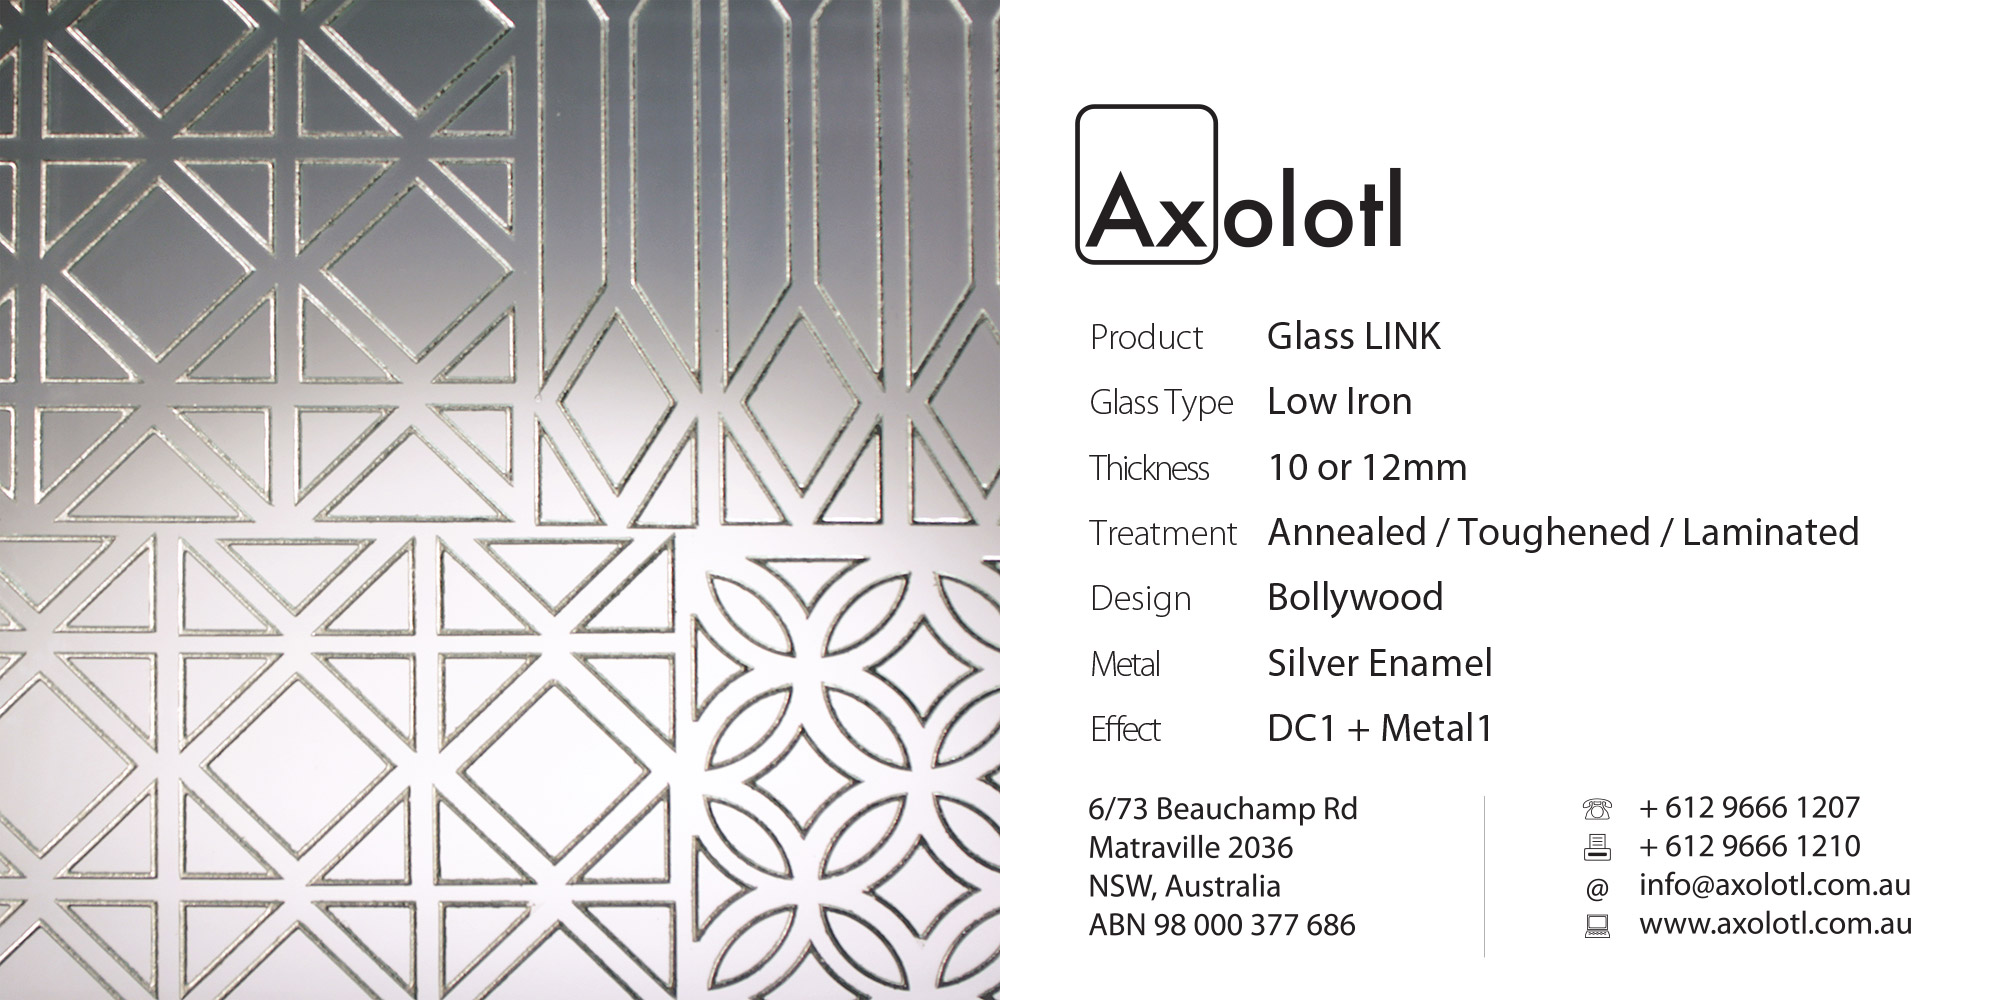 Axolotl_GlassLINK_Bollywood_Silver.jpg